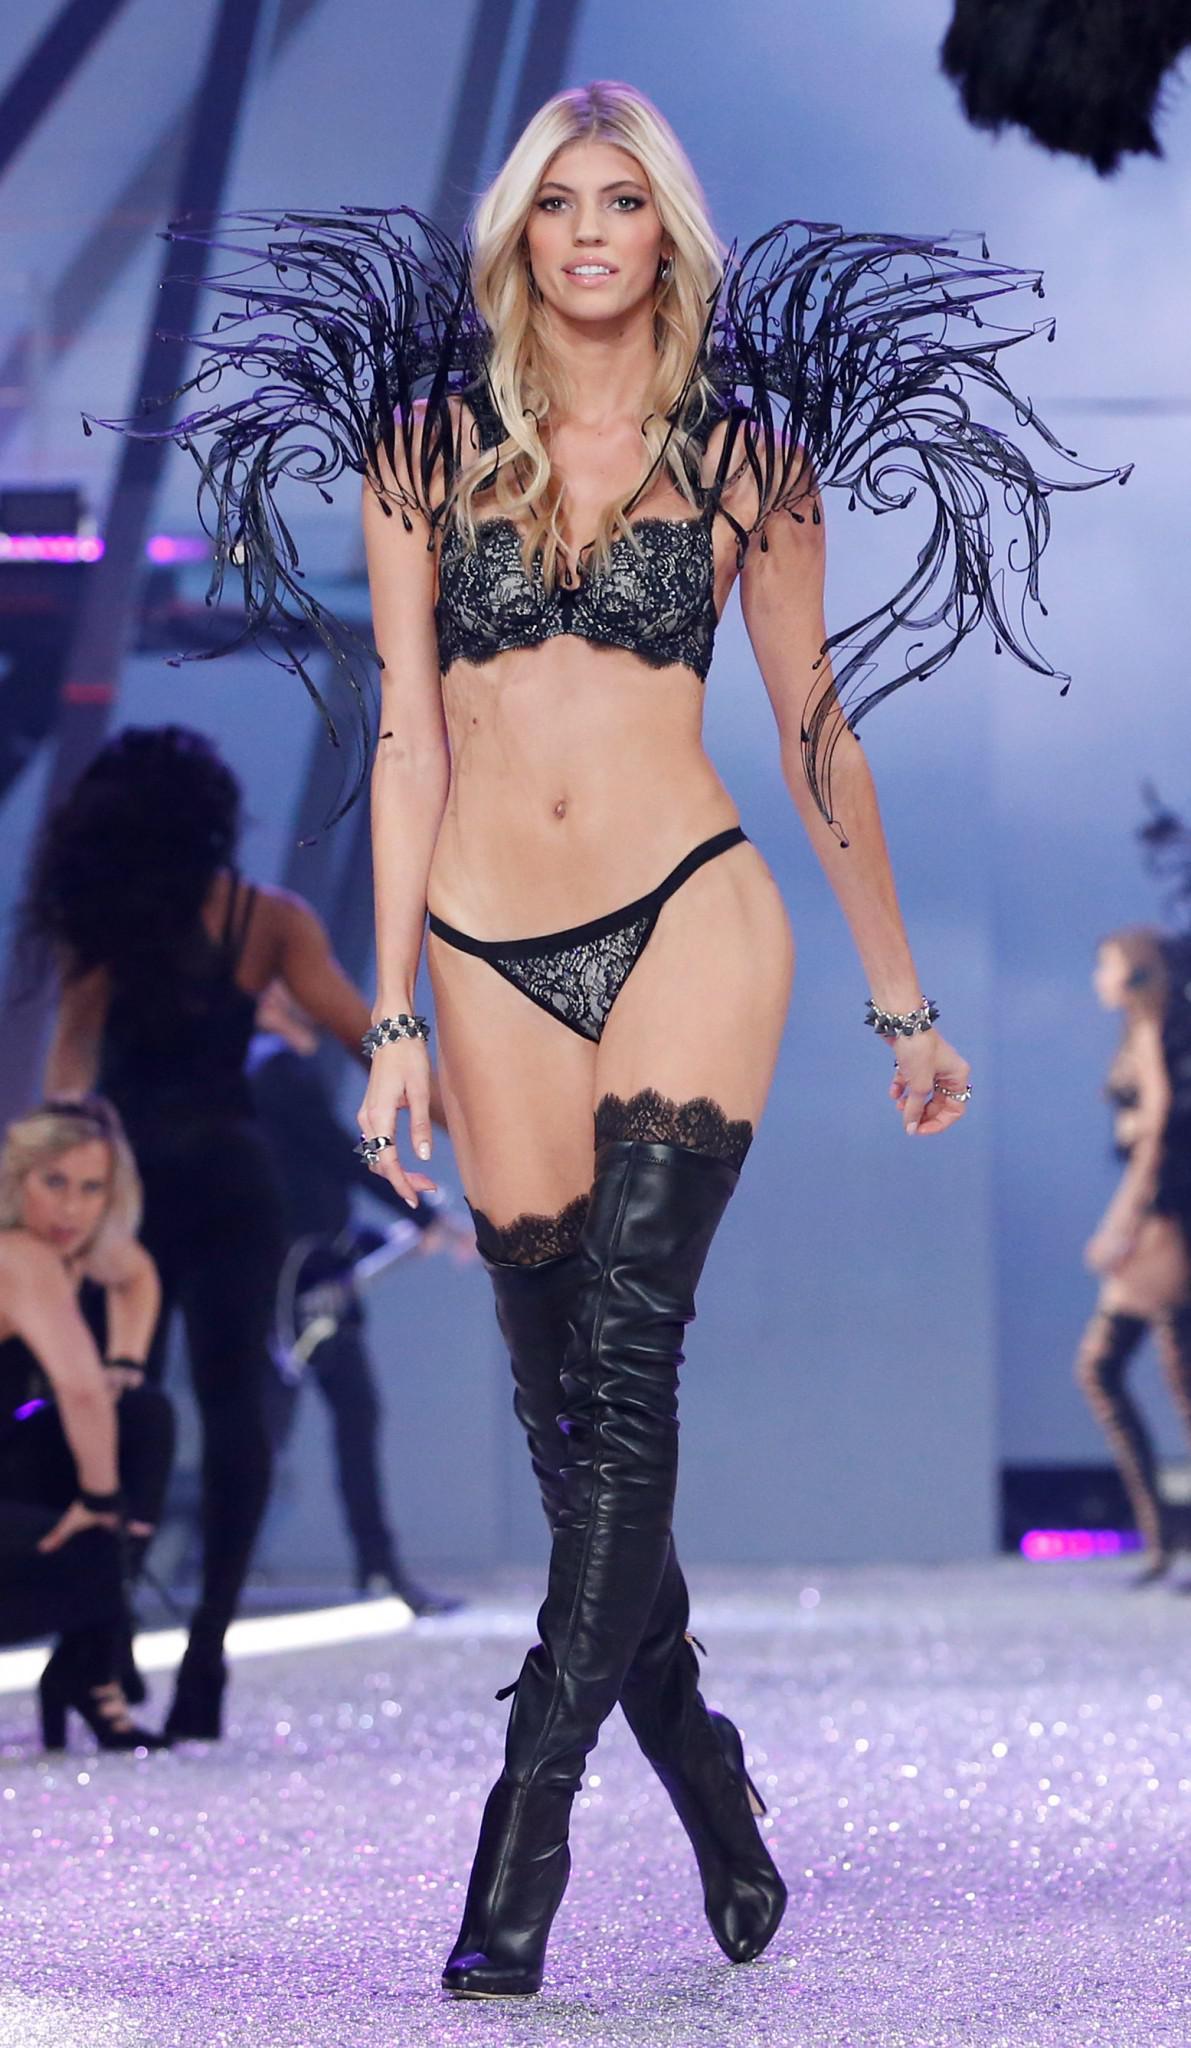 Victoria-Secret-show-esorouxa-modela-1300-19 Το show της Victoria's Secret που «κόλασε» το Παρίσι με τα αγγελάκια της